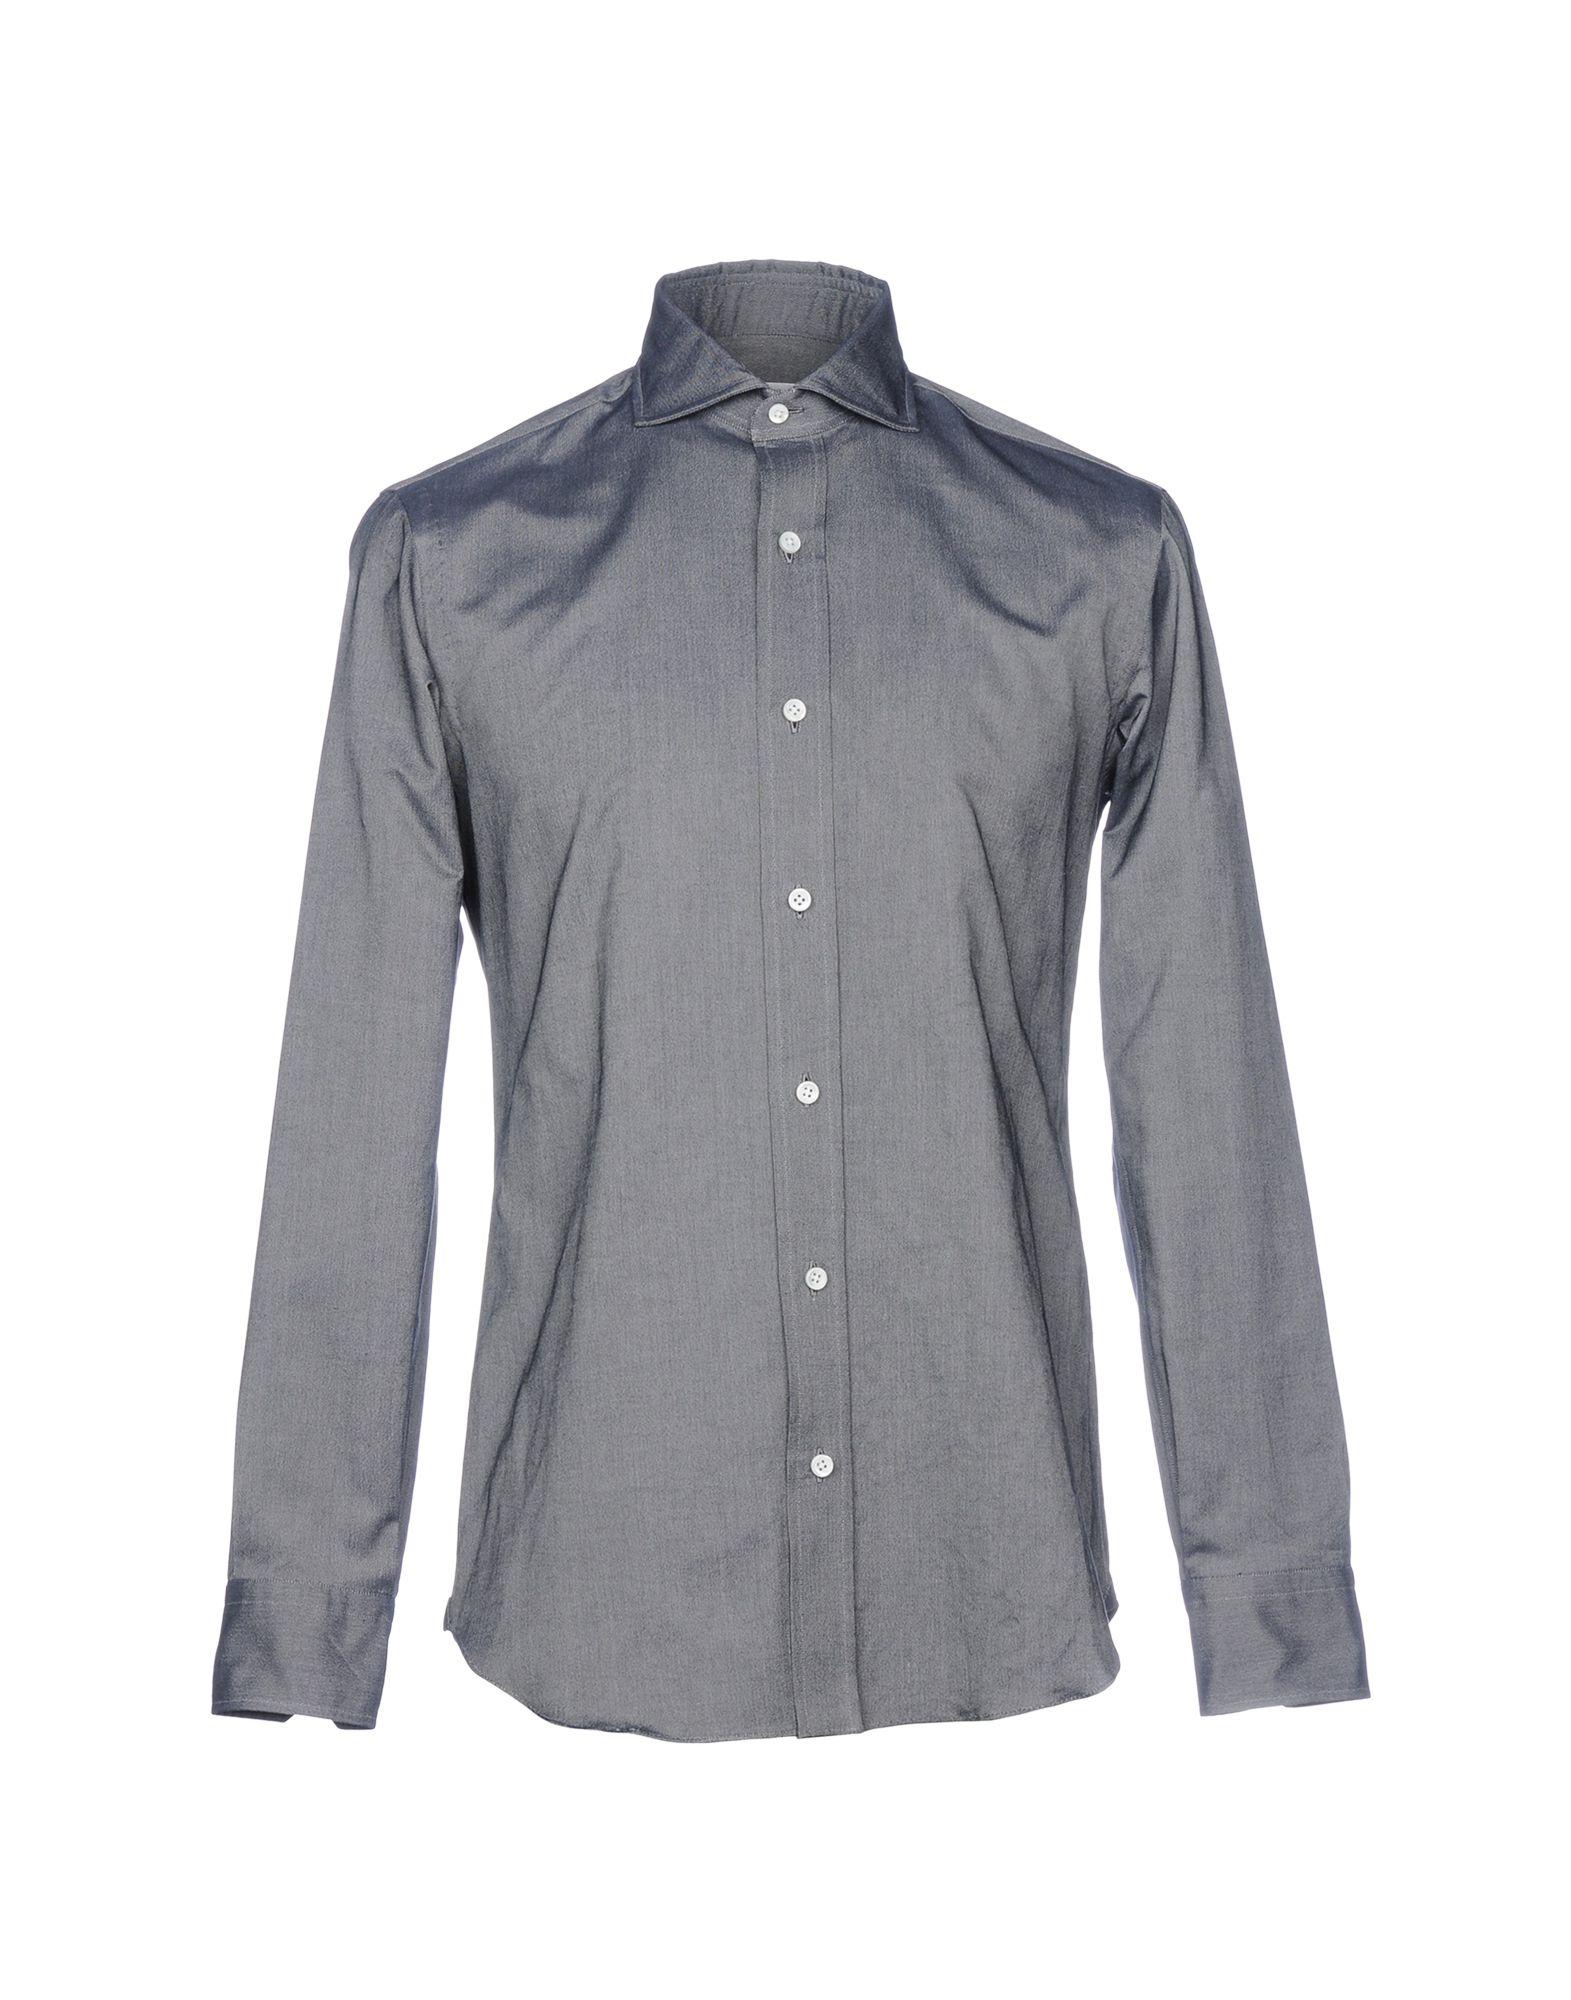 SALVATORE PICCOLO Denim Shirt in Steel Grey